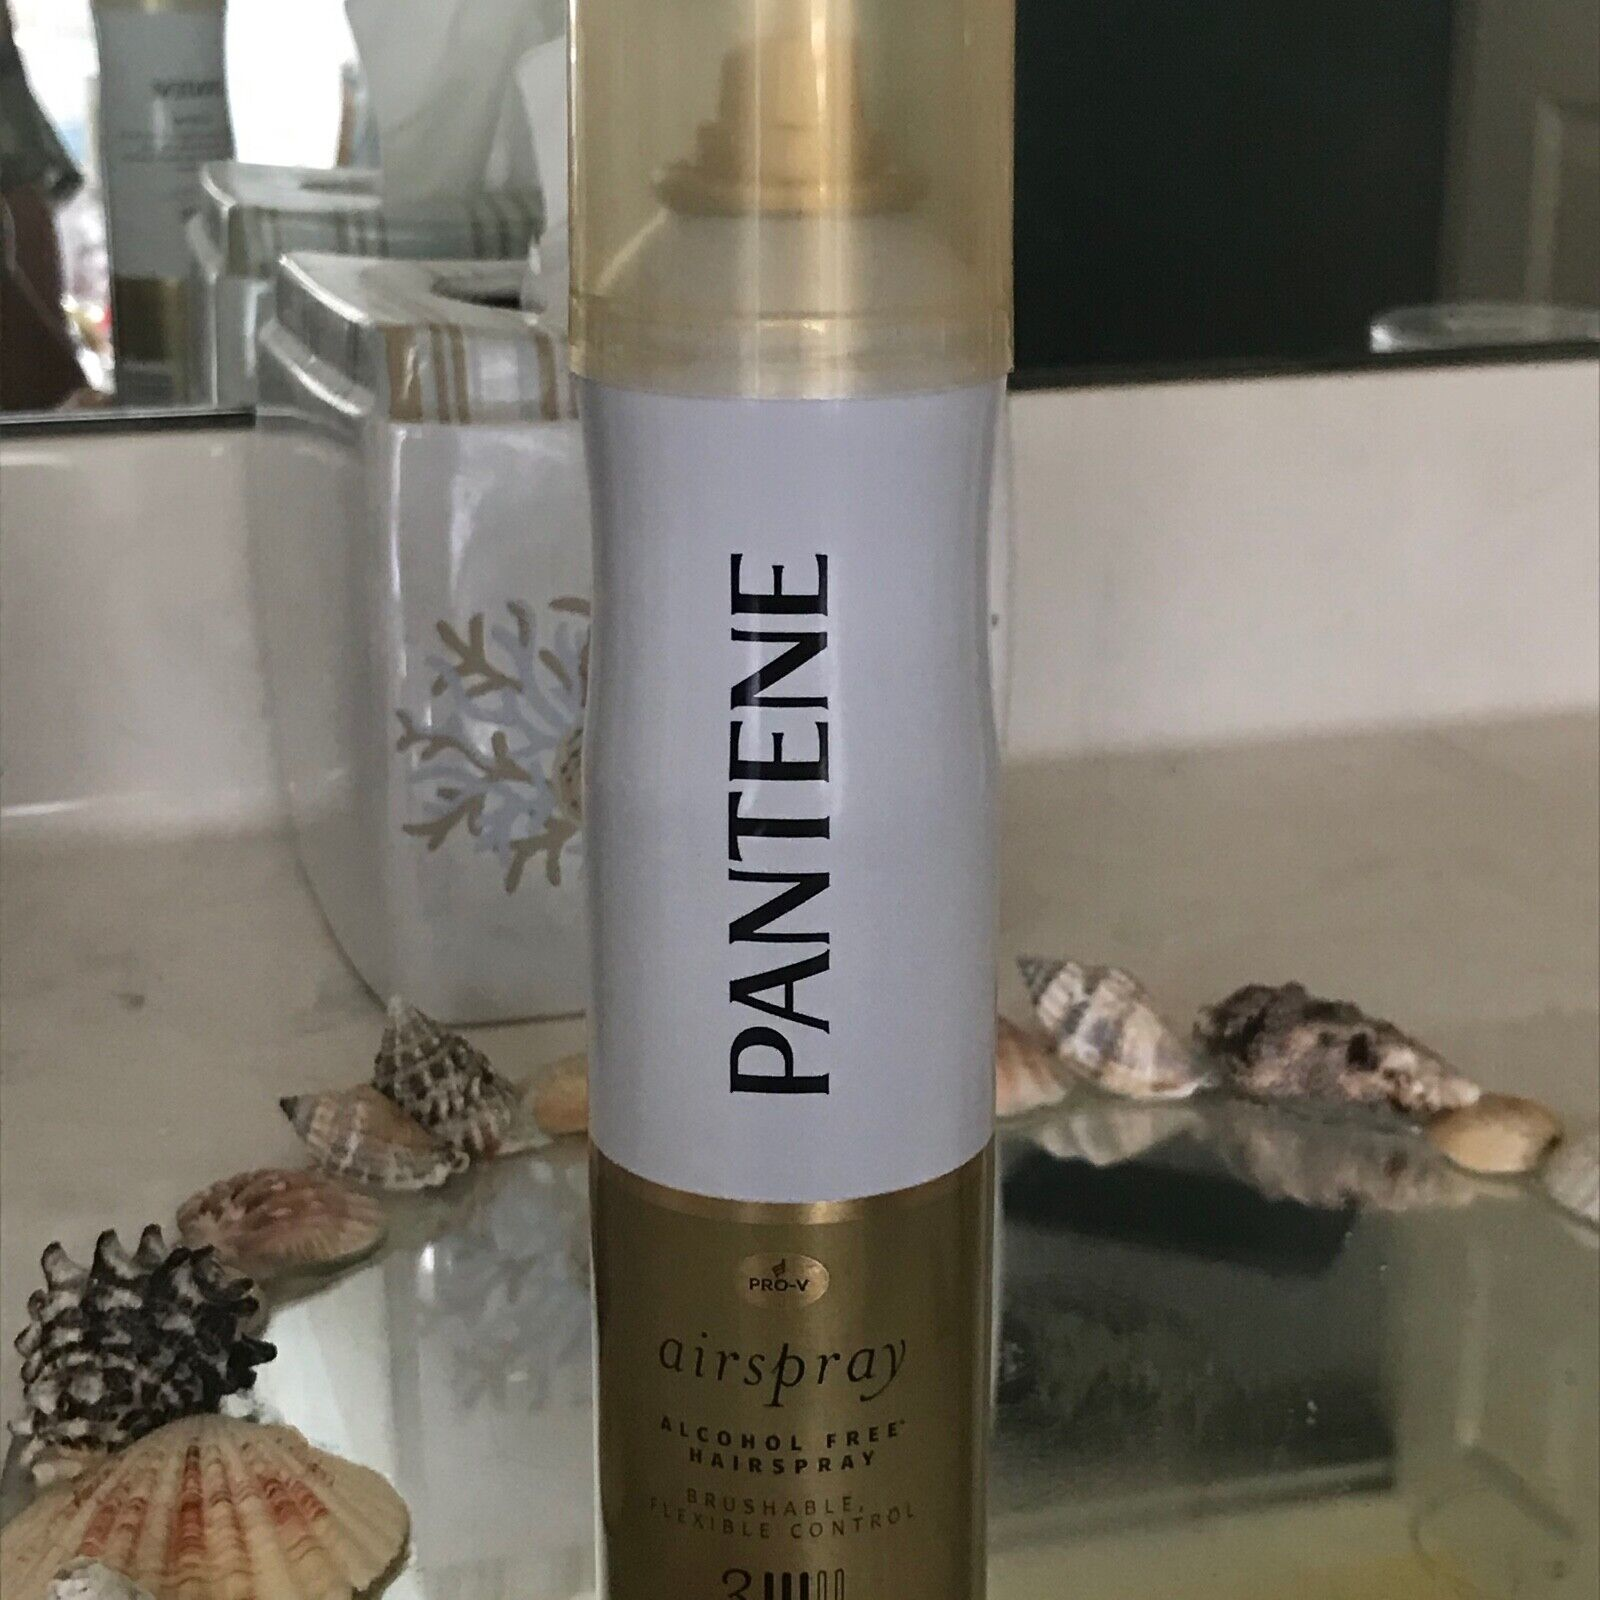 PANTENE AIR SPRAY ALCOHOL FREE HAIRSPRAY 3 BRUSHABLE 7oz NEW